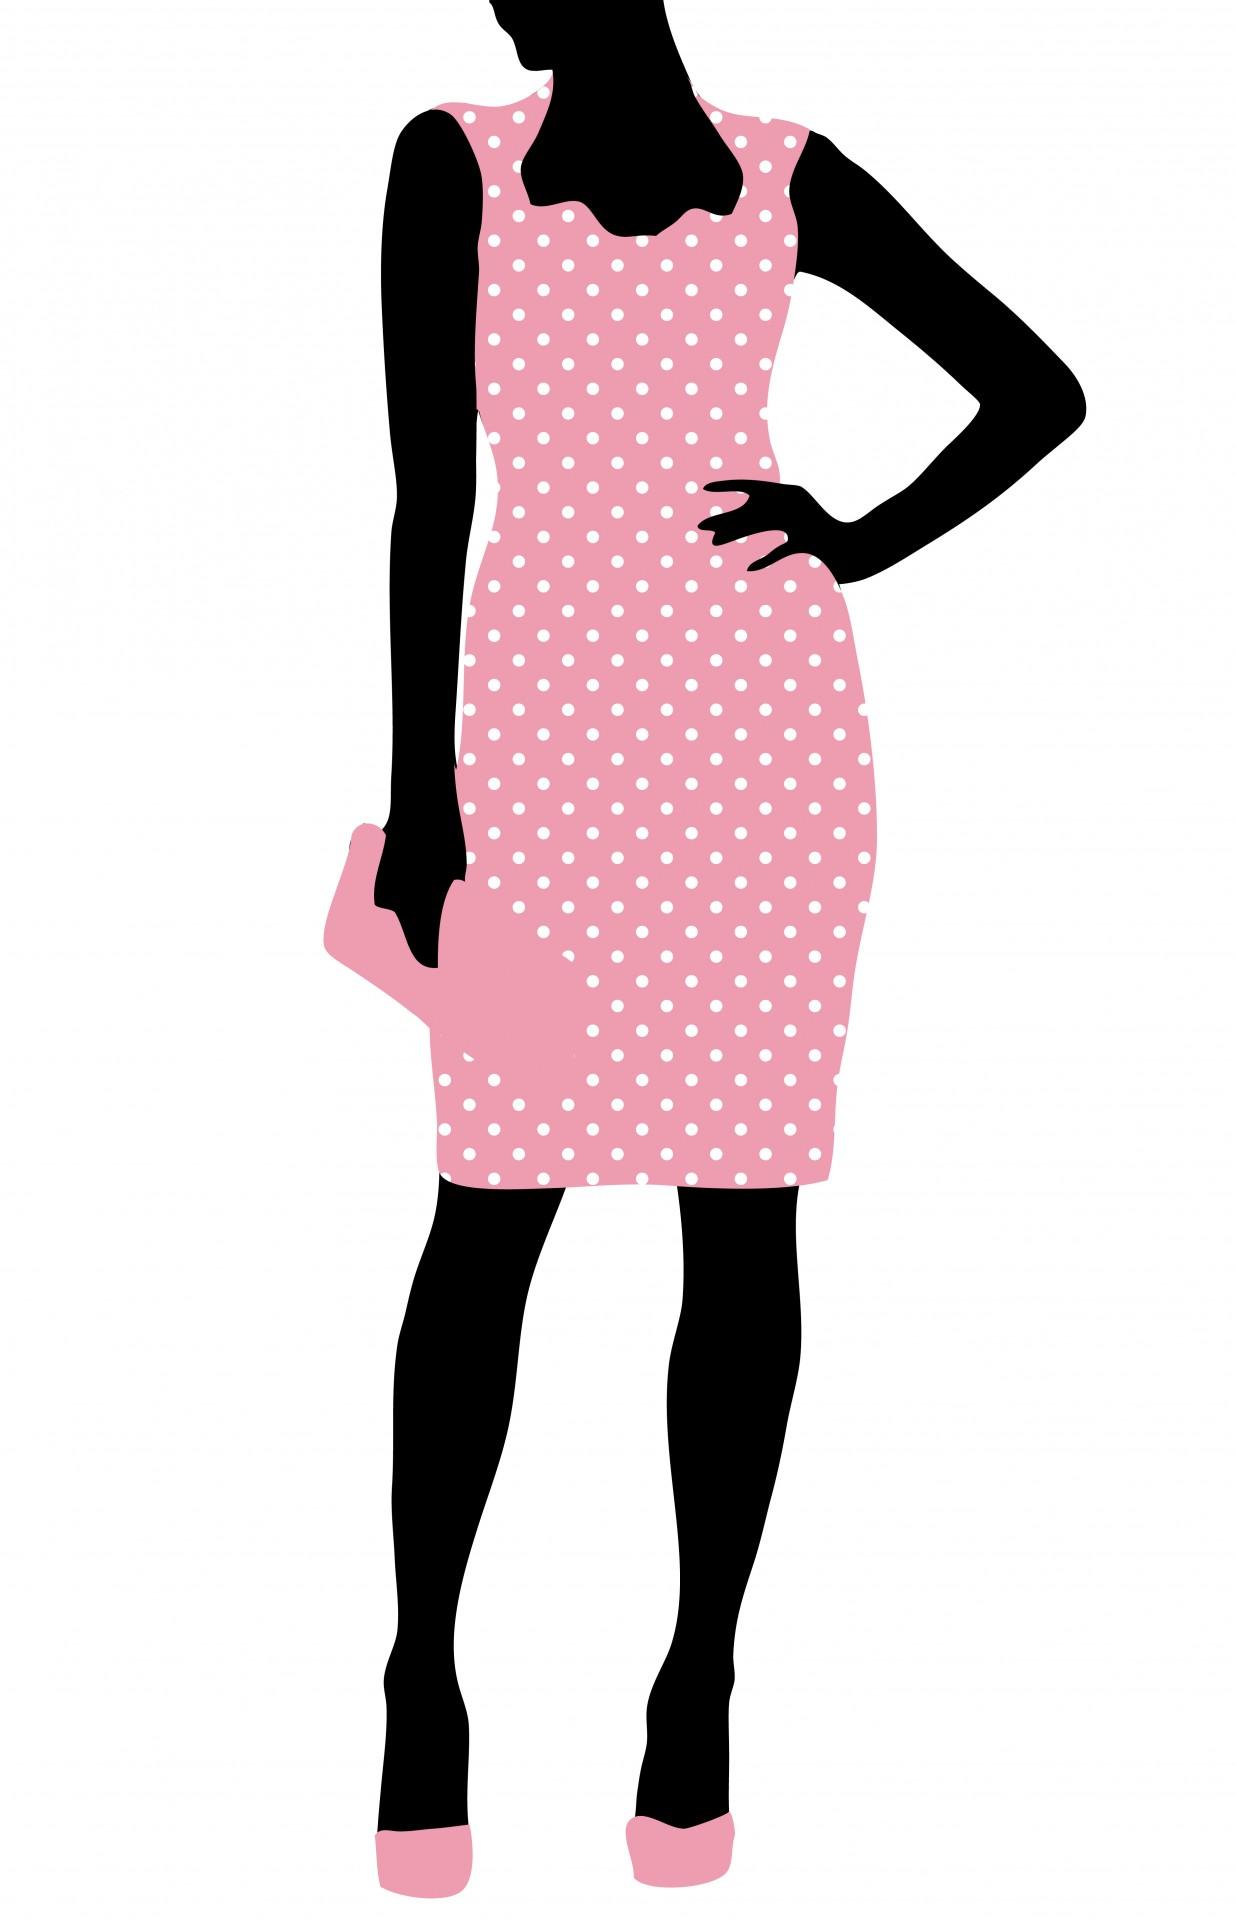 Fashion Woman Clipart Free Stock Photo.